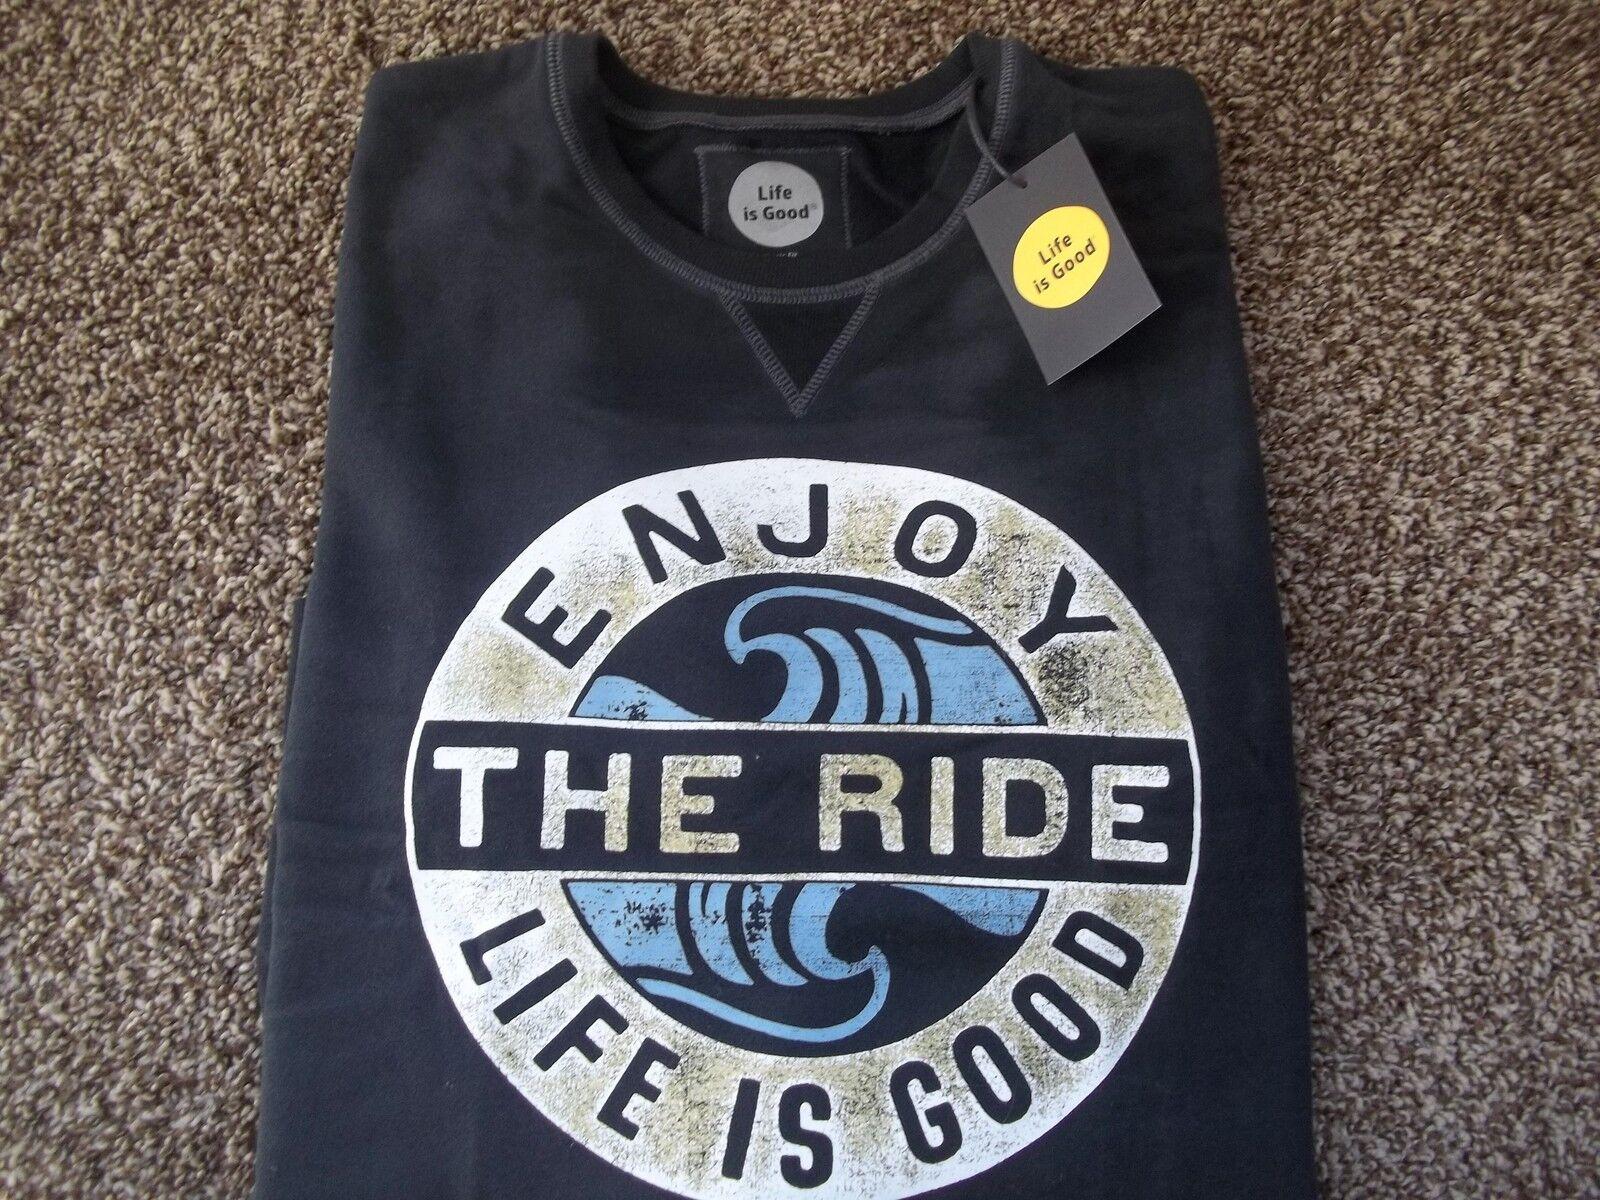 17f7e5e92d00a4 Life is Good Enjoy the Ride SweatshirtNEWSz M Fit Classic  nnkpdd1964-Hoodies   Sweatshirts